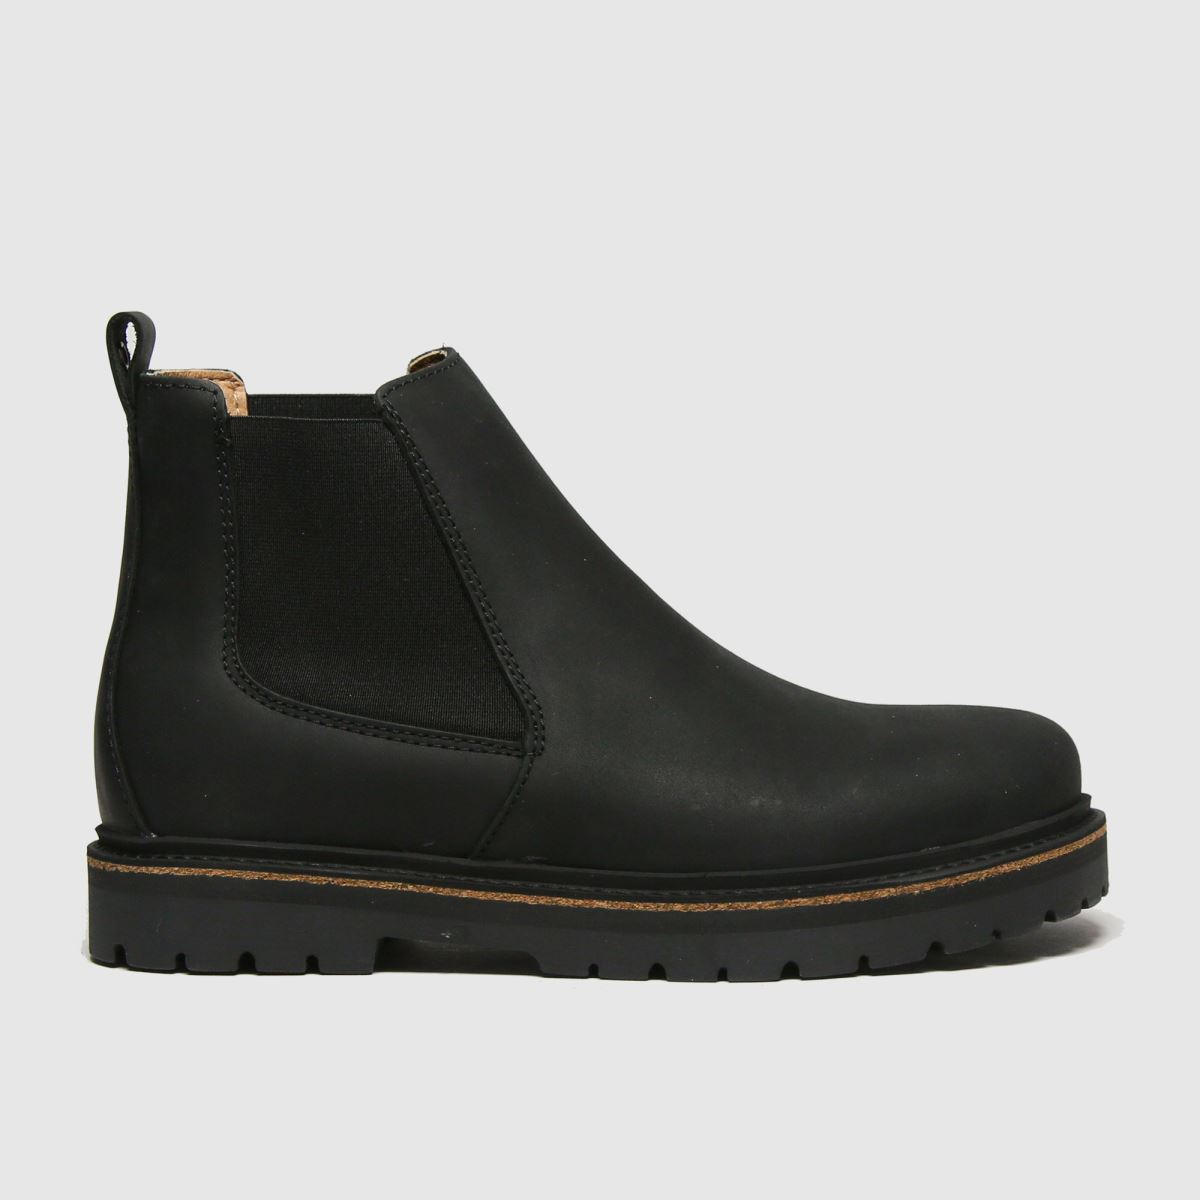 Birkenstock Black Stalon Boots